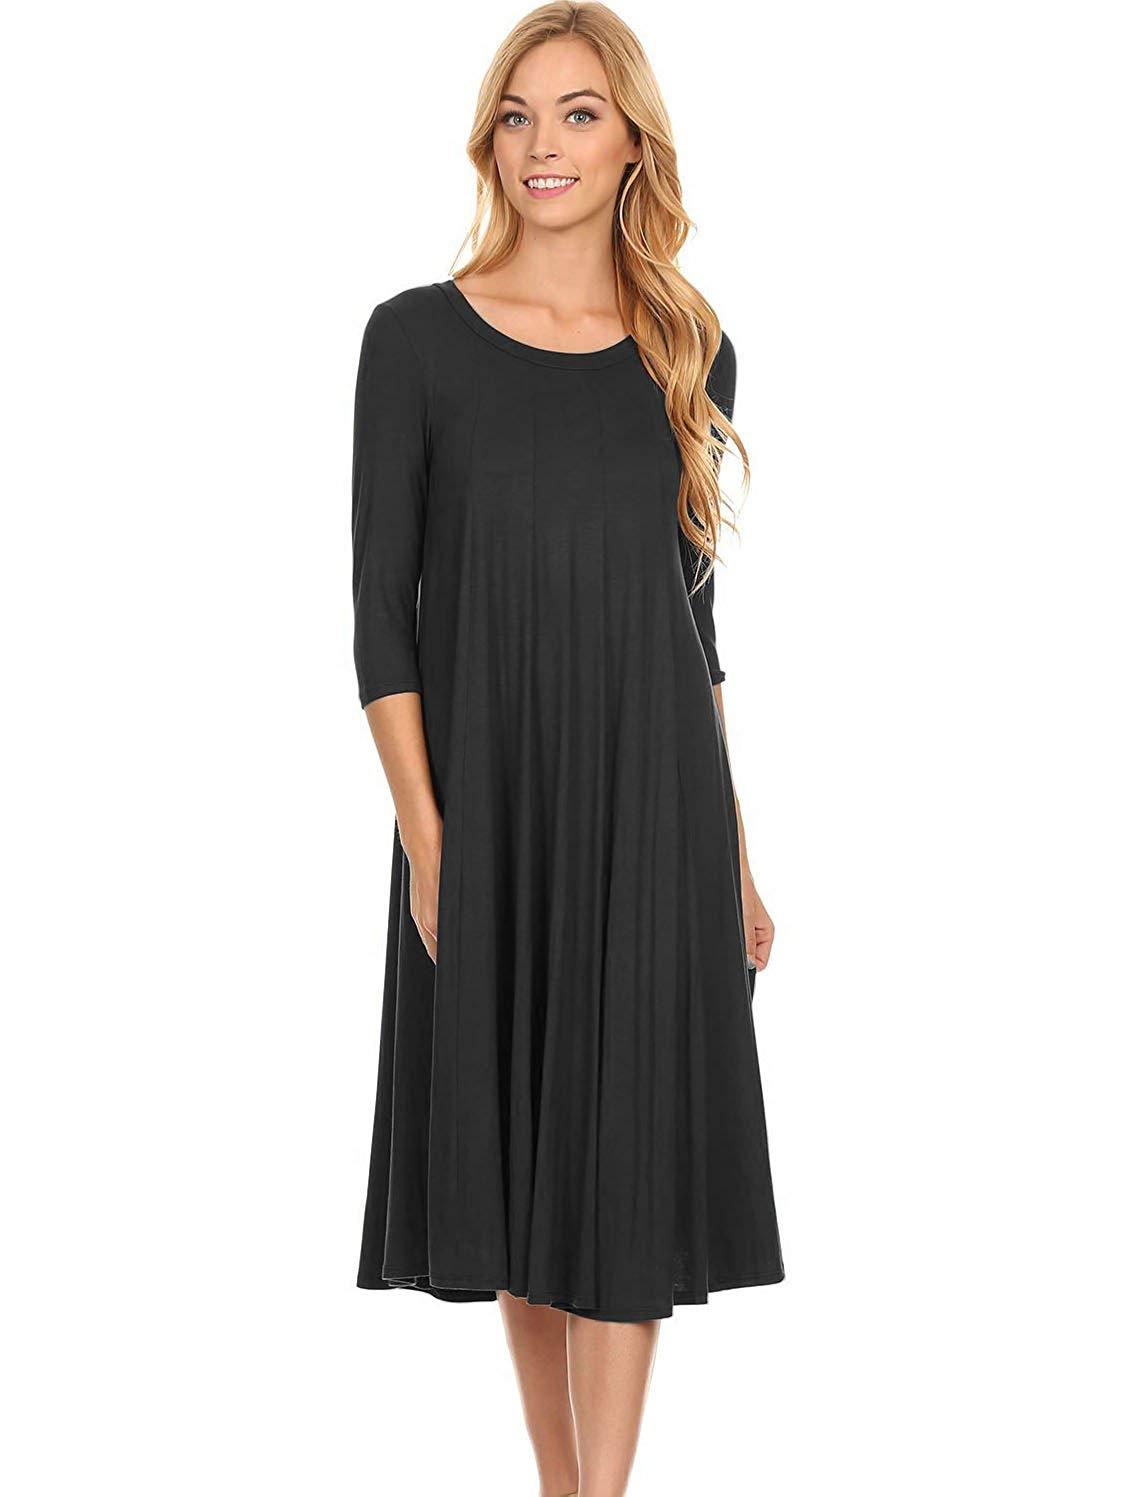 e50a1c6cac931 Get Quotations · Modern Kiwi Long Sleeve Flowy Maxi Dress (S-4X)